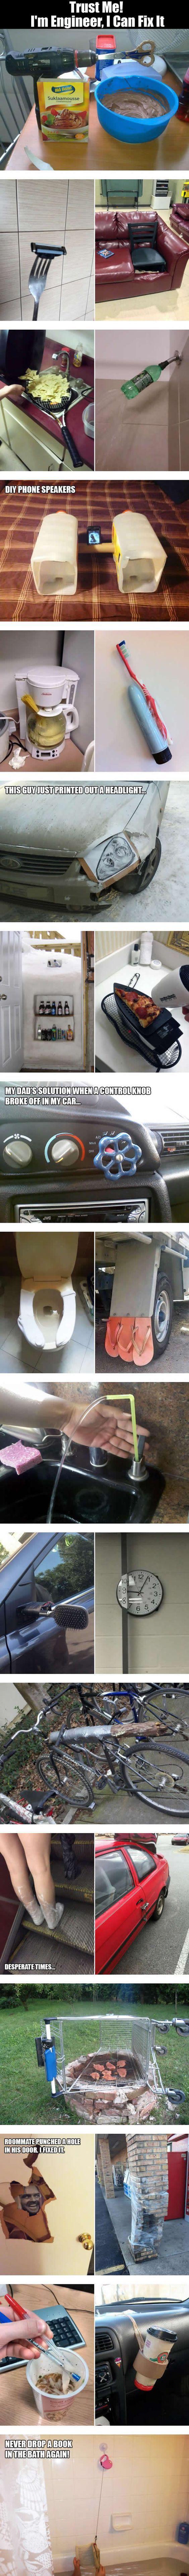 trust me, i am an engineer